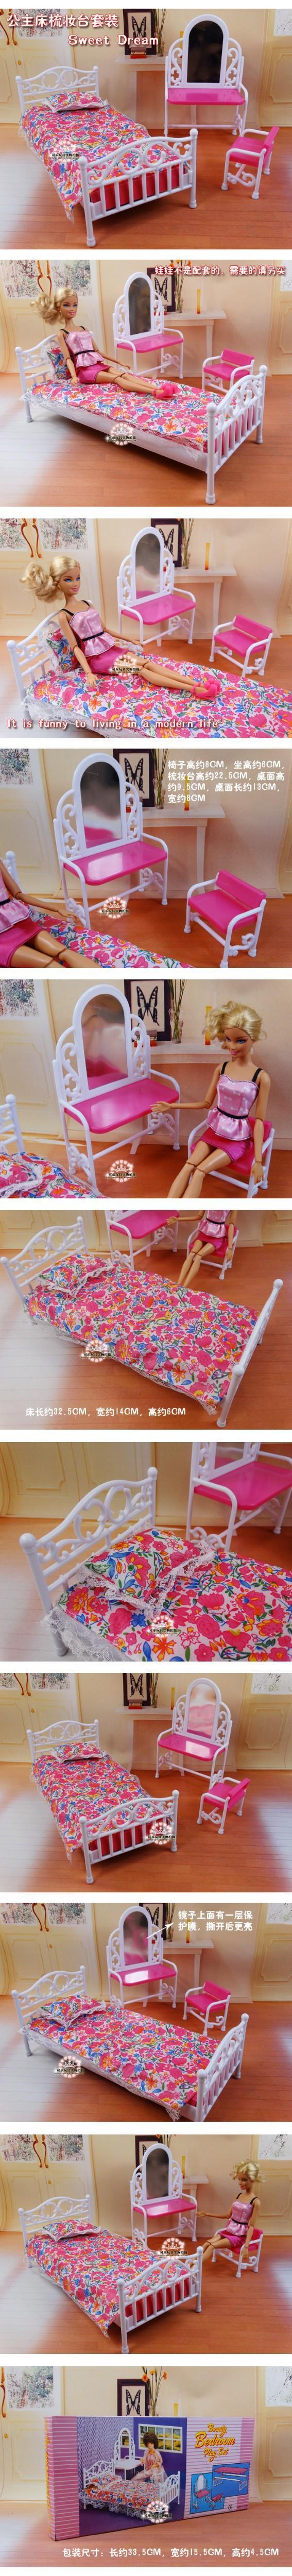 Free Transport,Dream Mattress Set dresser for barbie doll,doll furnishings doll equipment for barbie,kids diy toys new